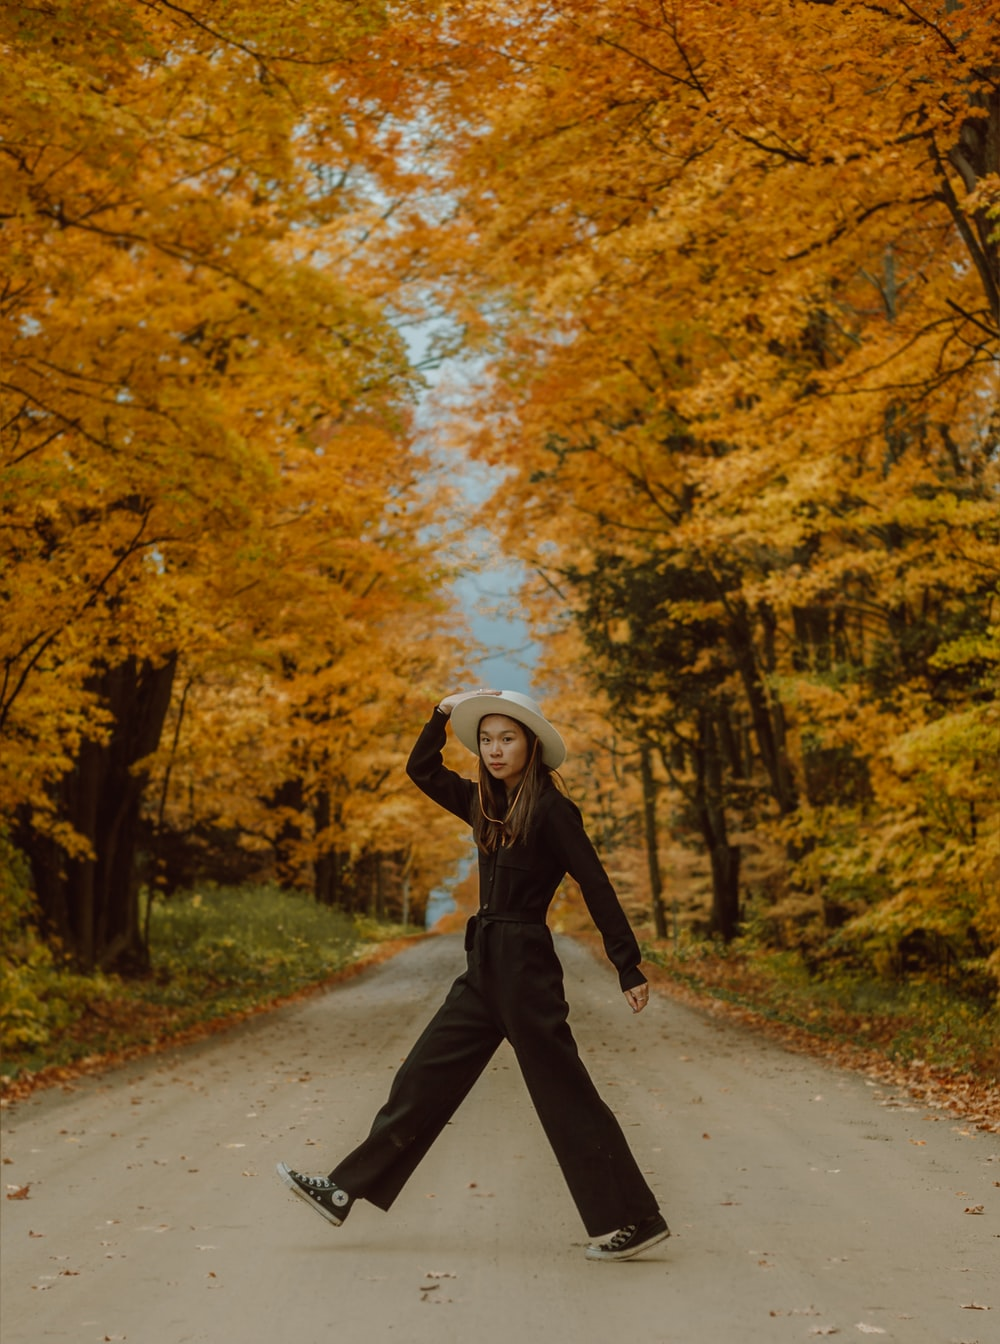 woman in black jacket and black pants walking on road between trees during daytime